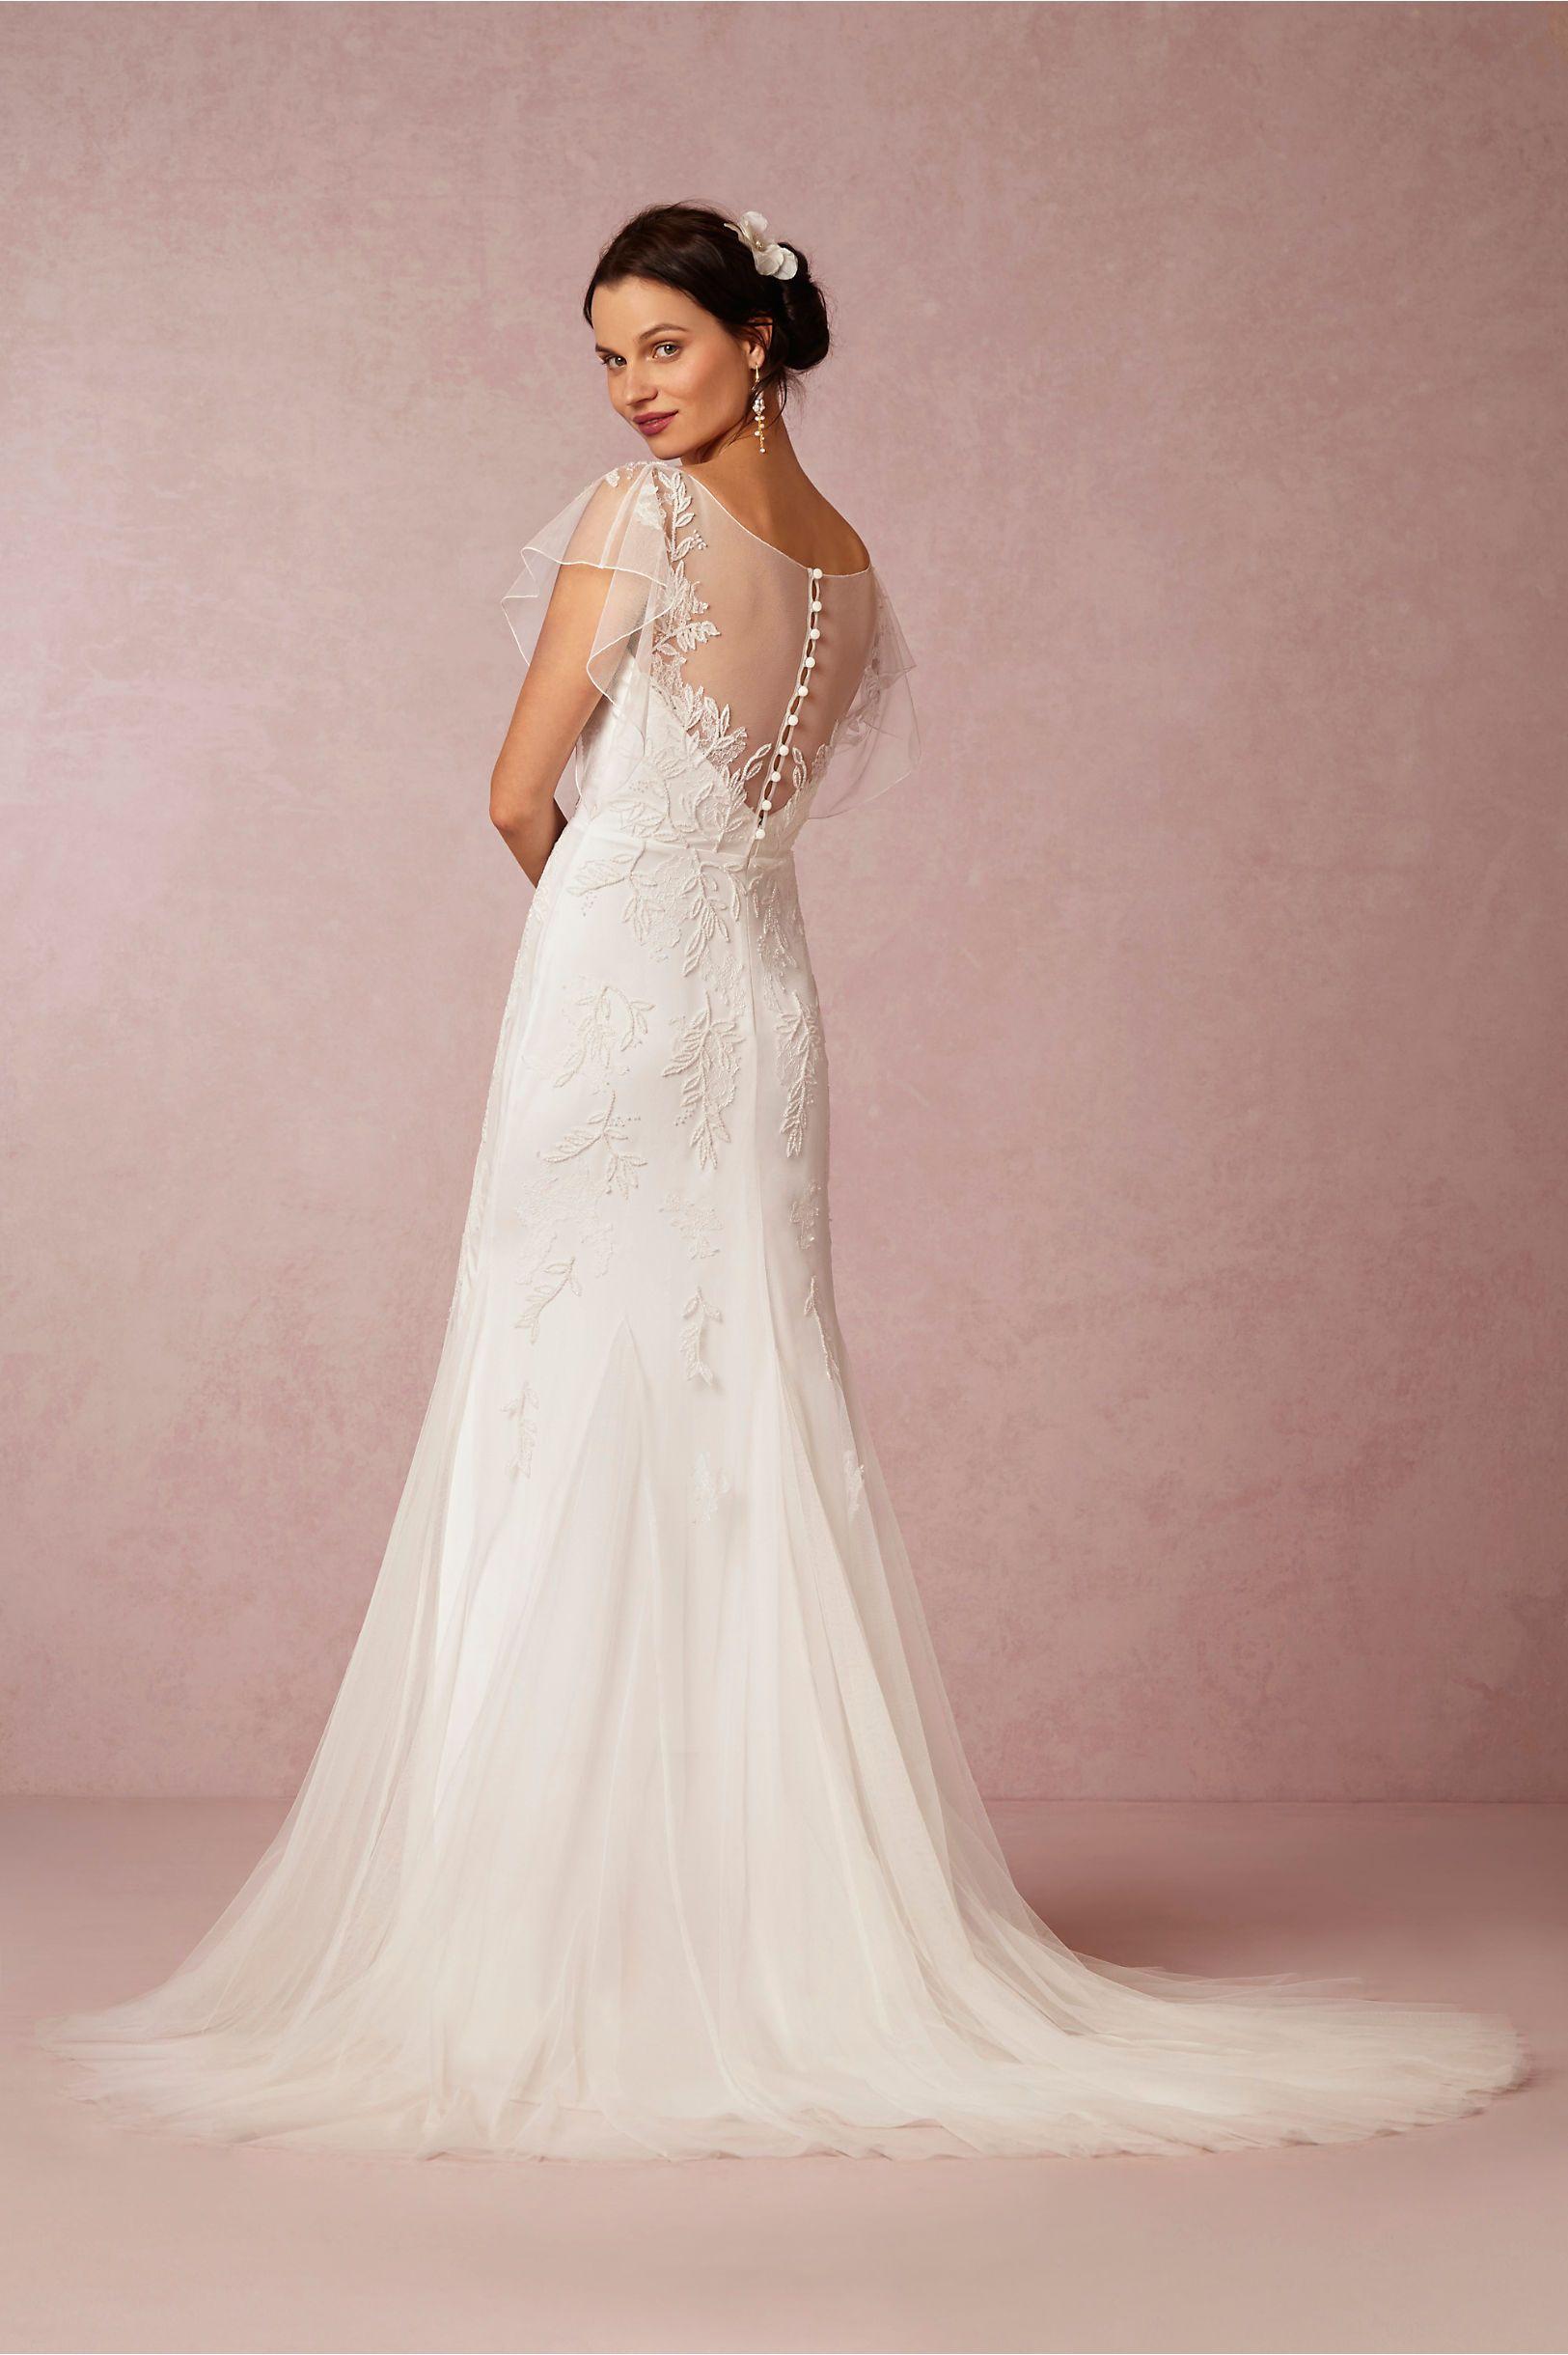 Bettina Gown from @BHLDN | Mandatory Wedding Board | Pinterest ...